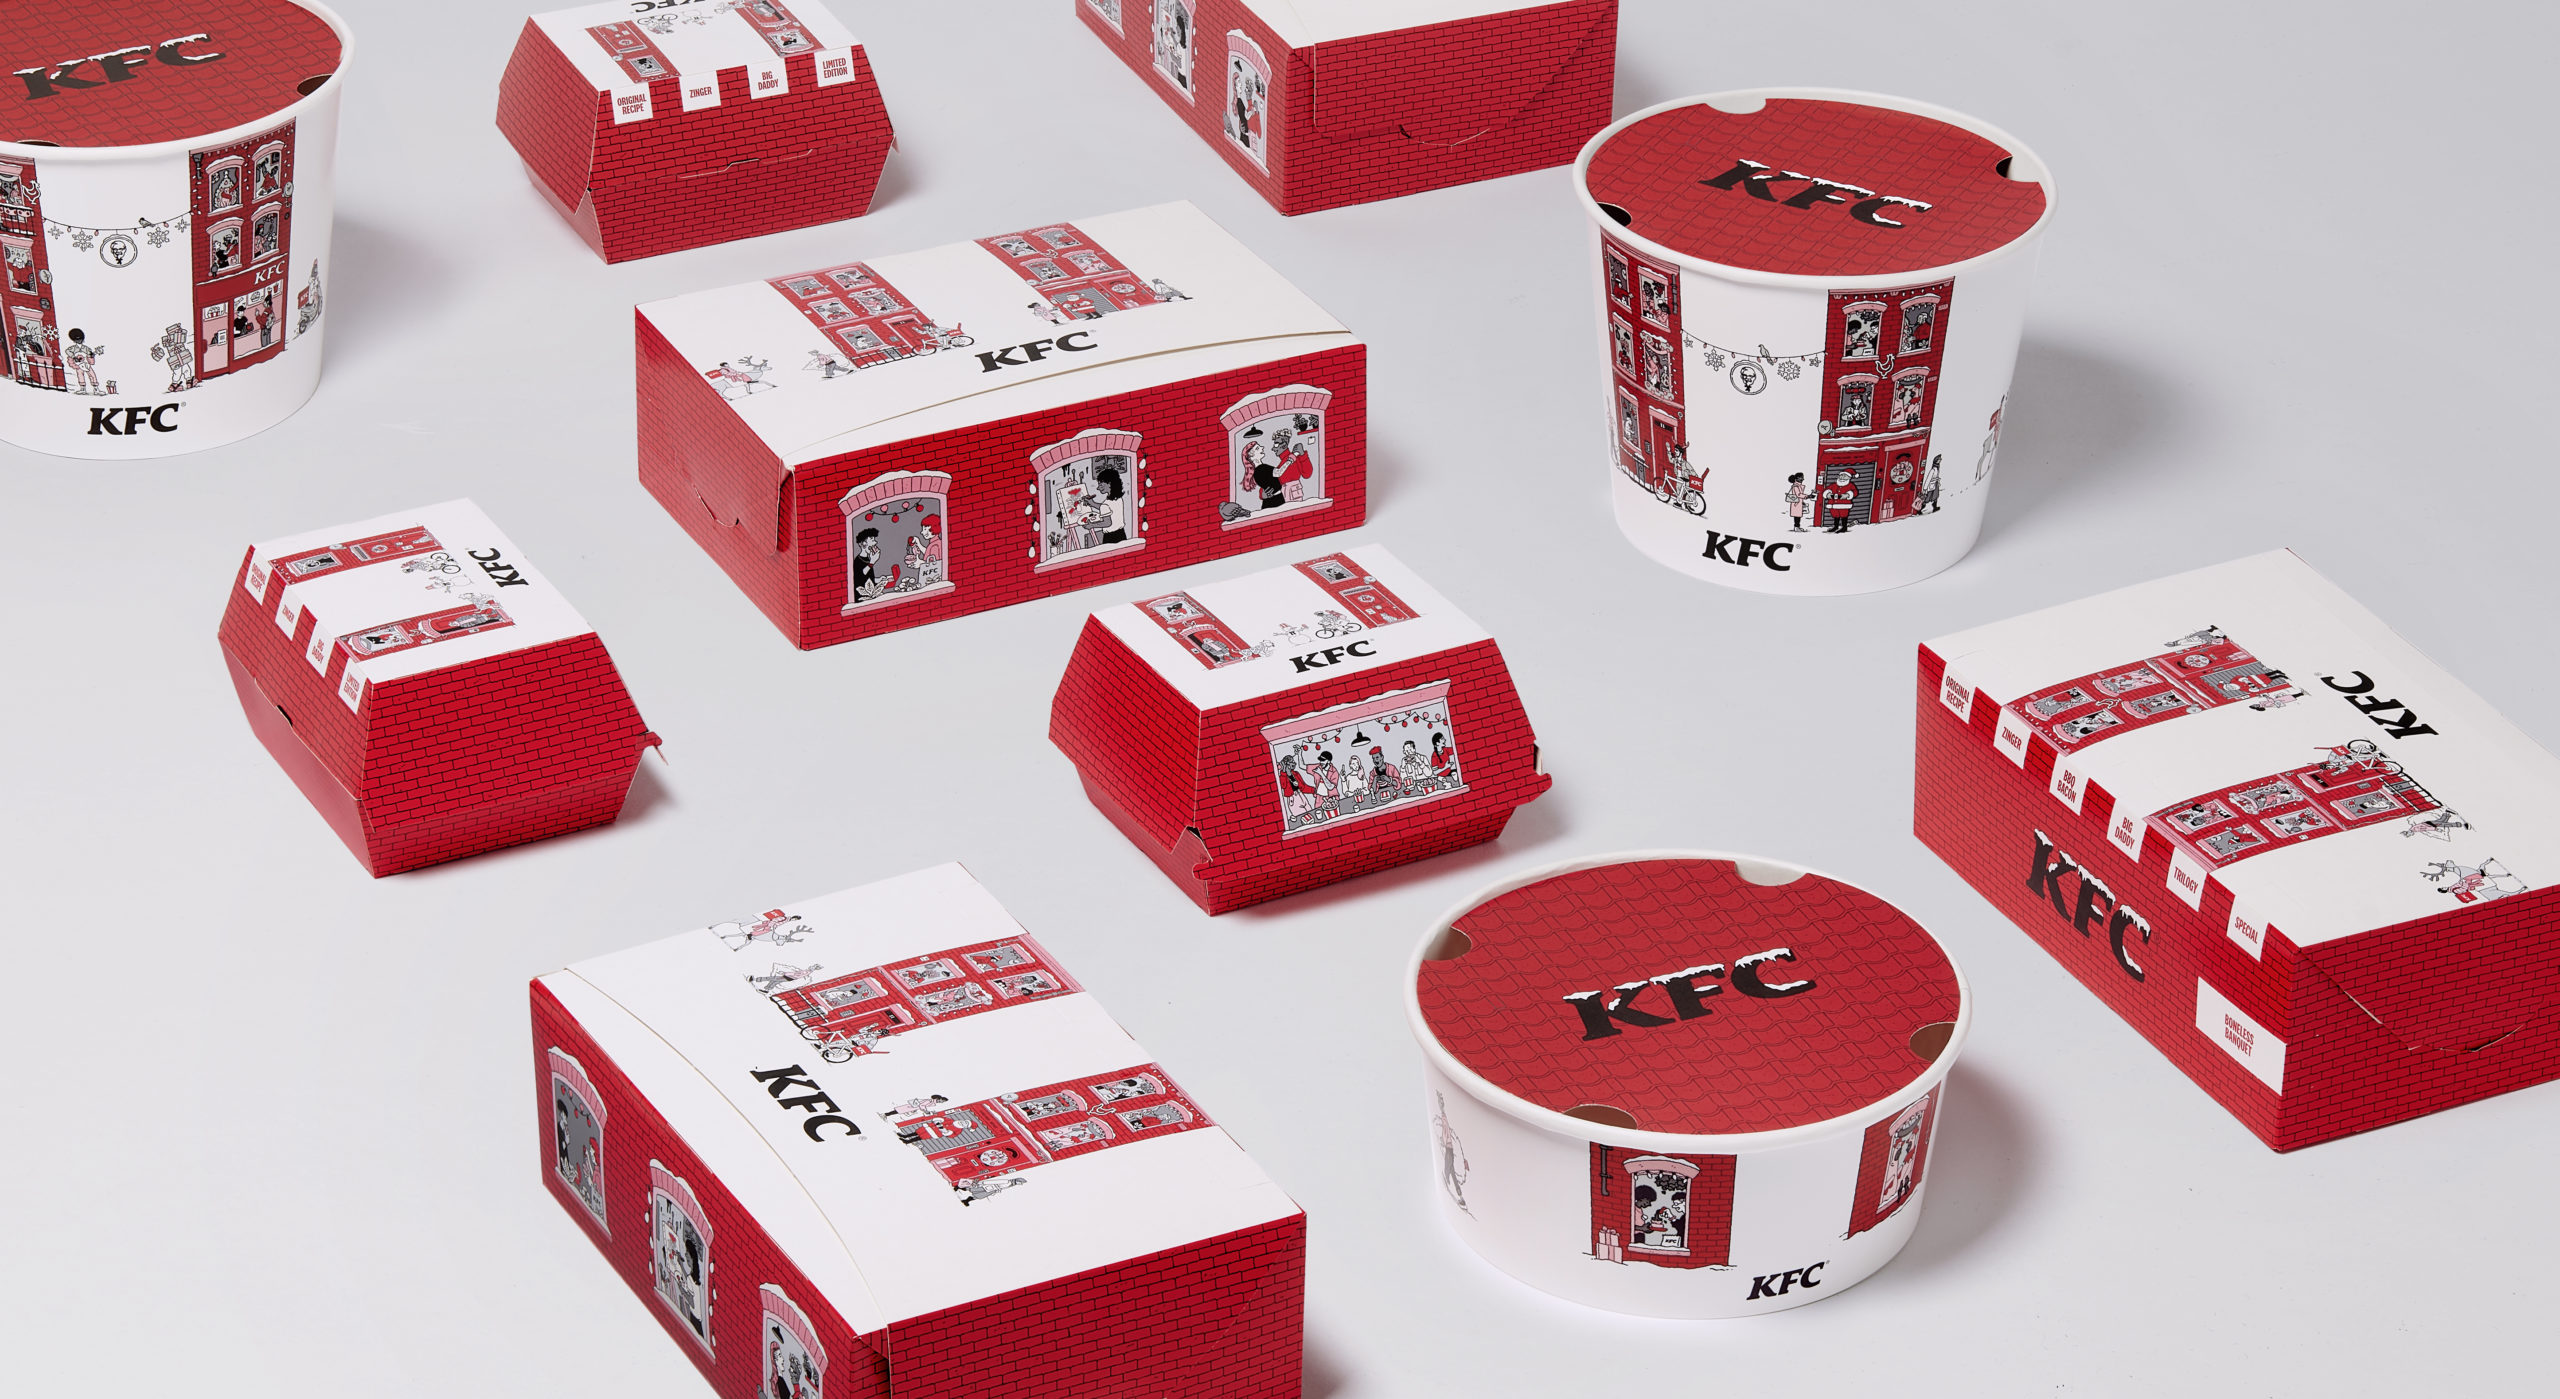 KFC - Bringing Christmas to the Table